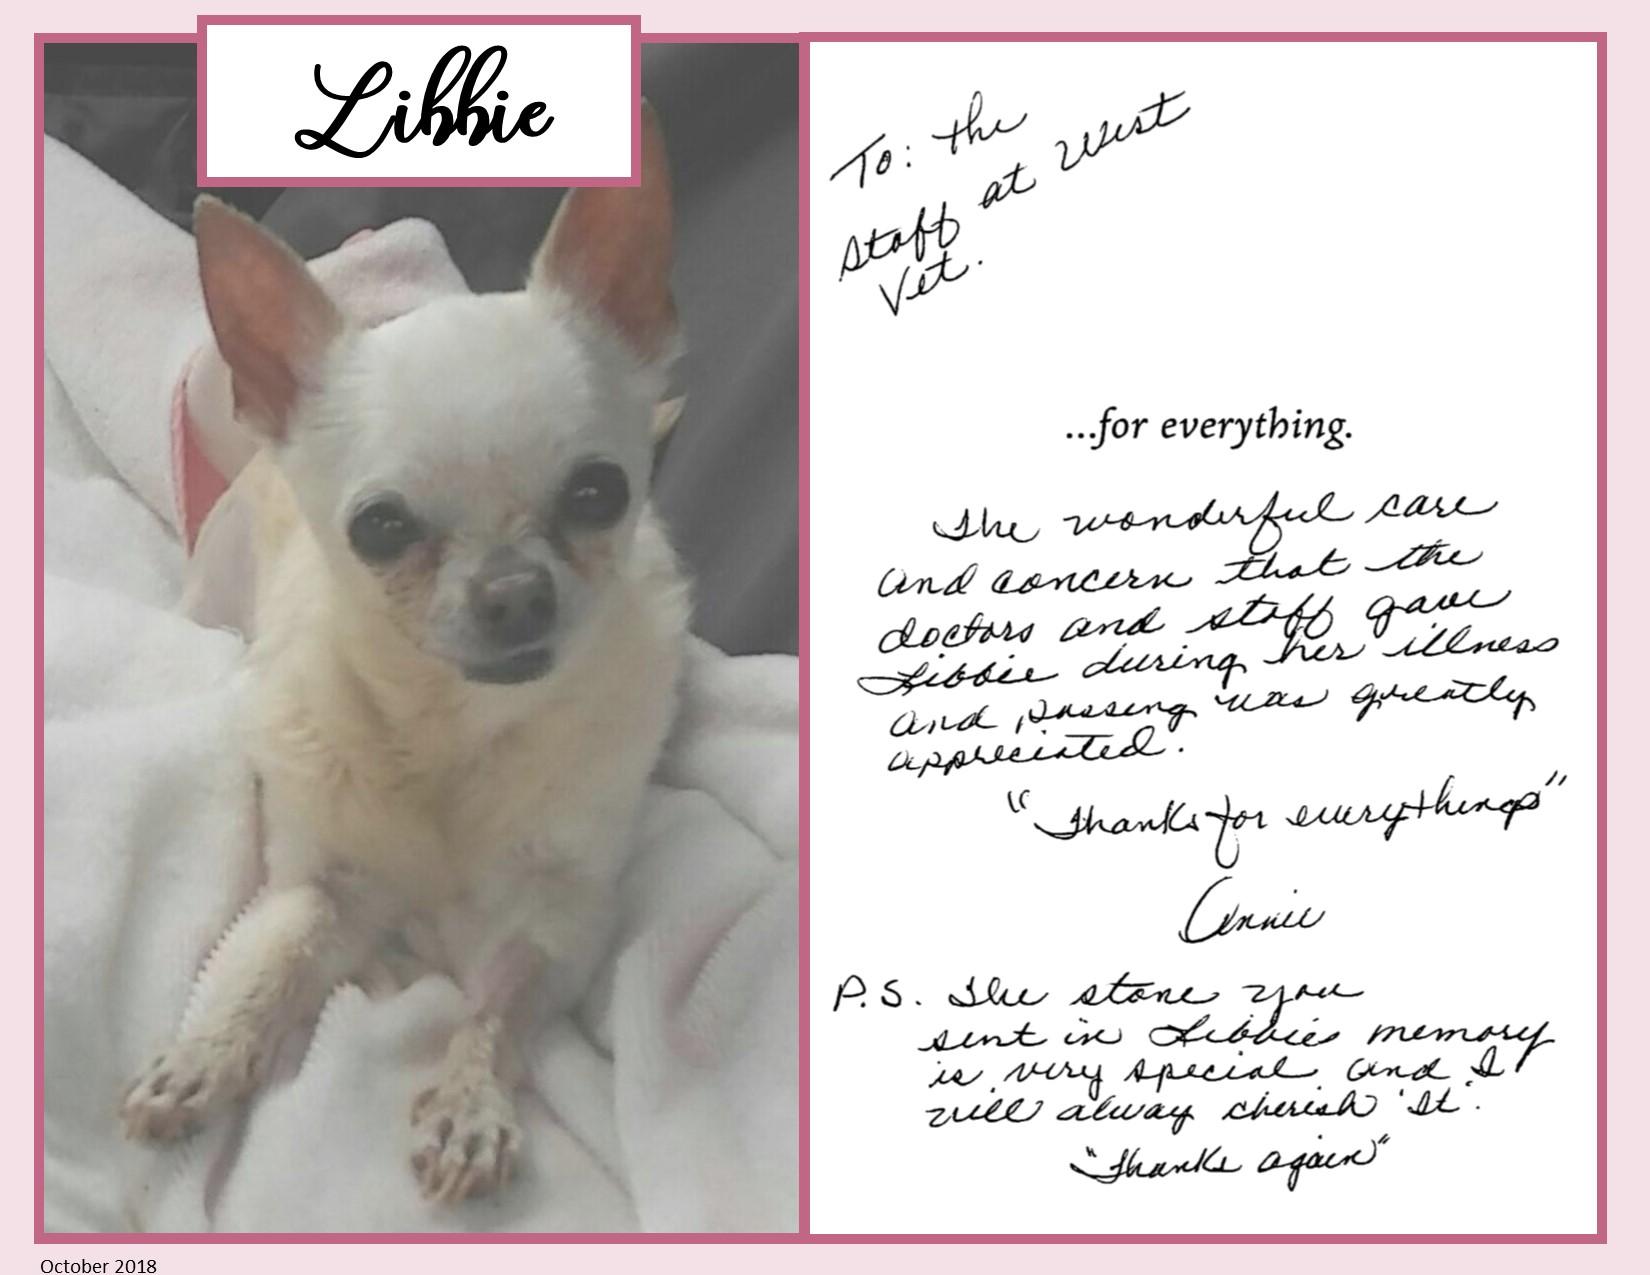 Libbie Lung